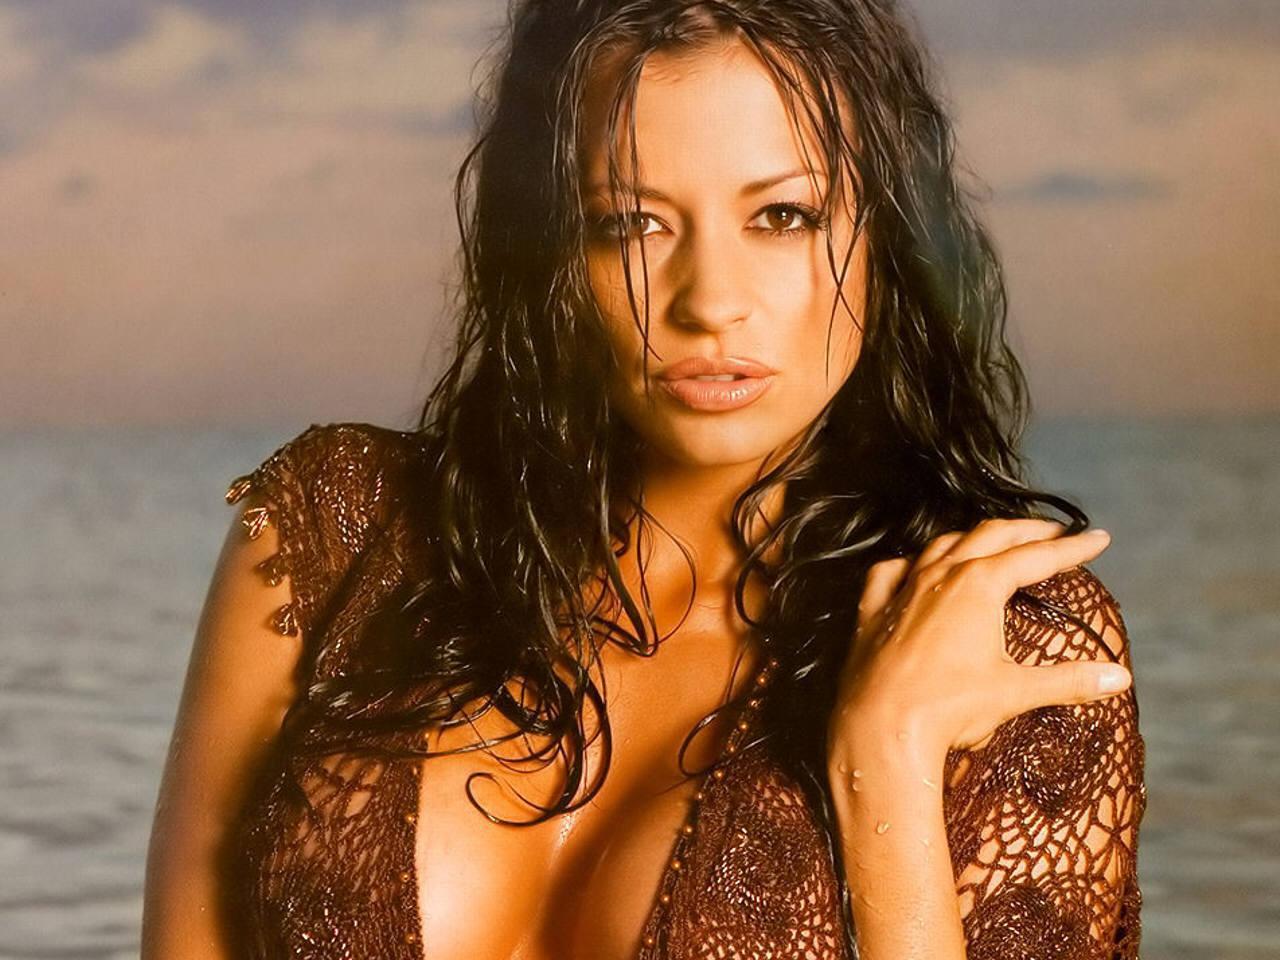 http://4.bp.blogspot.com/-yqE7-OdY-BI/TpS1FpCIJDI/AAAAAAAAFcA/pOrAipUfg4U/s1600/Candice+Michelle_1.jpg